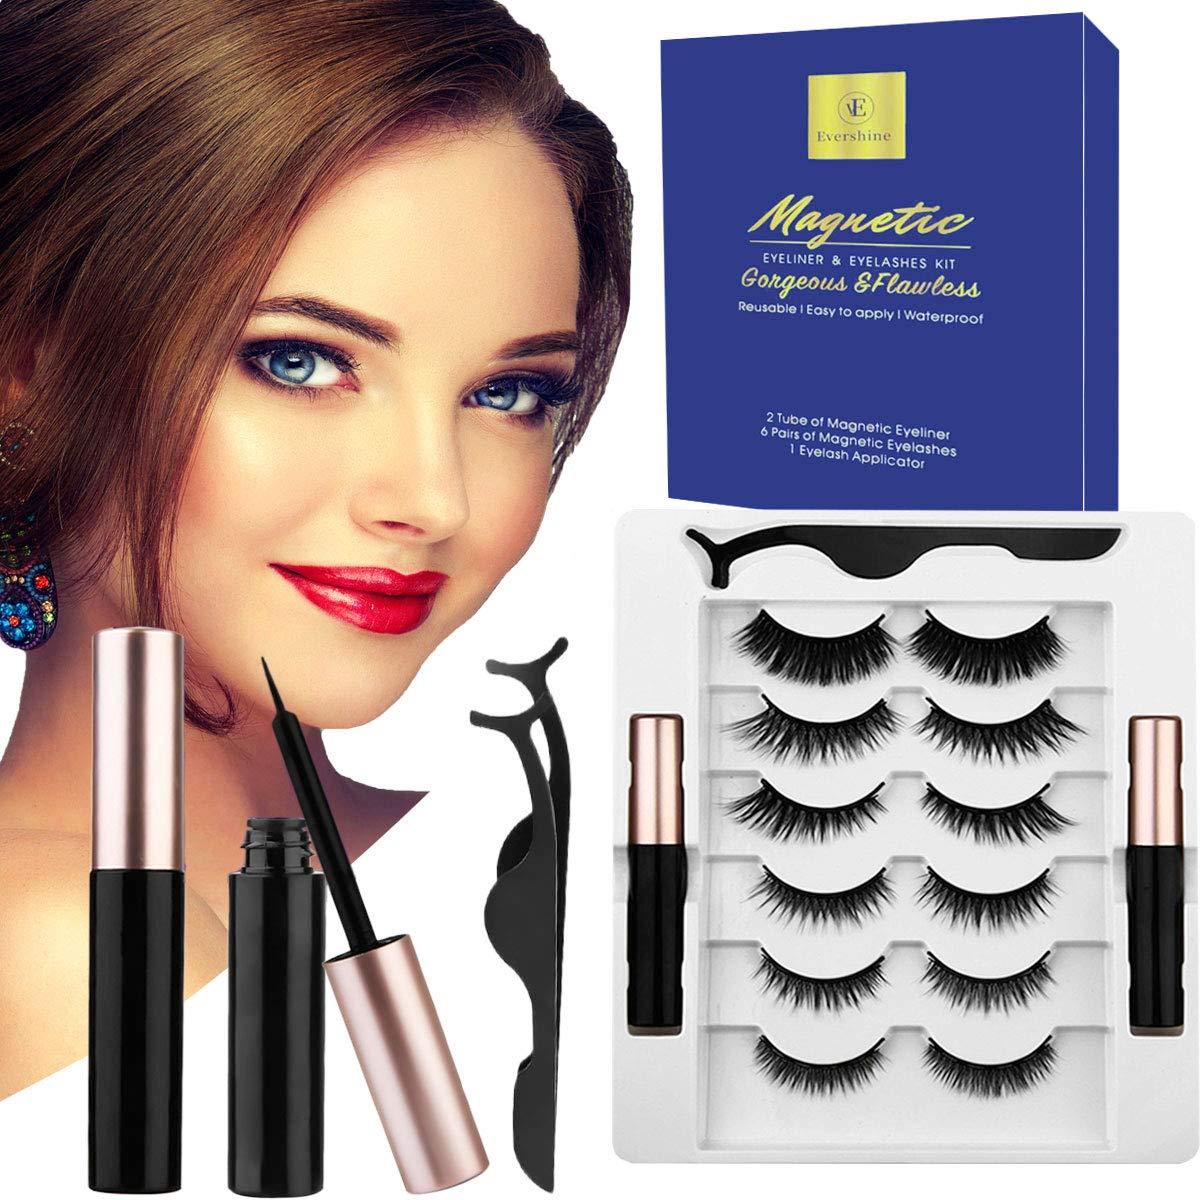 Magnetic Eyelashes Kit-NO Eyelash Needed Ranking TOP4 Reusable In stock Glue